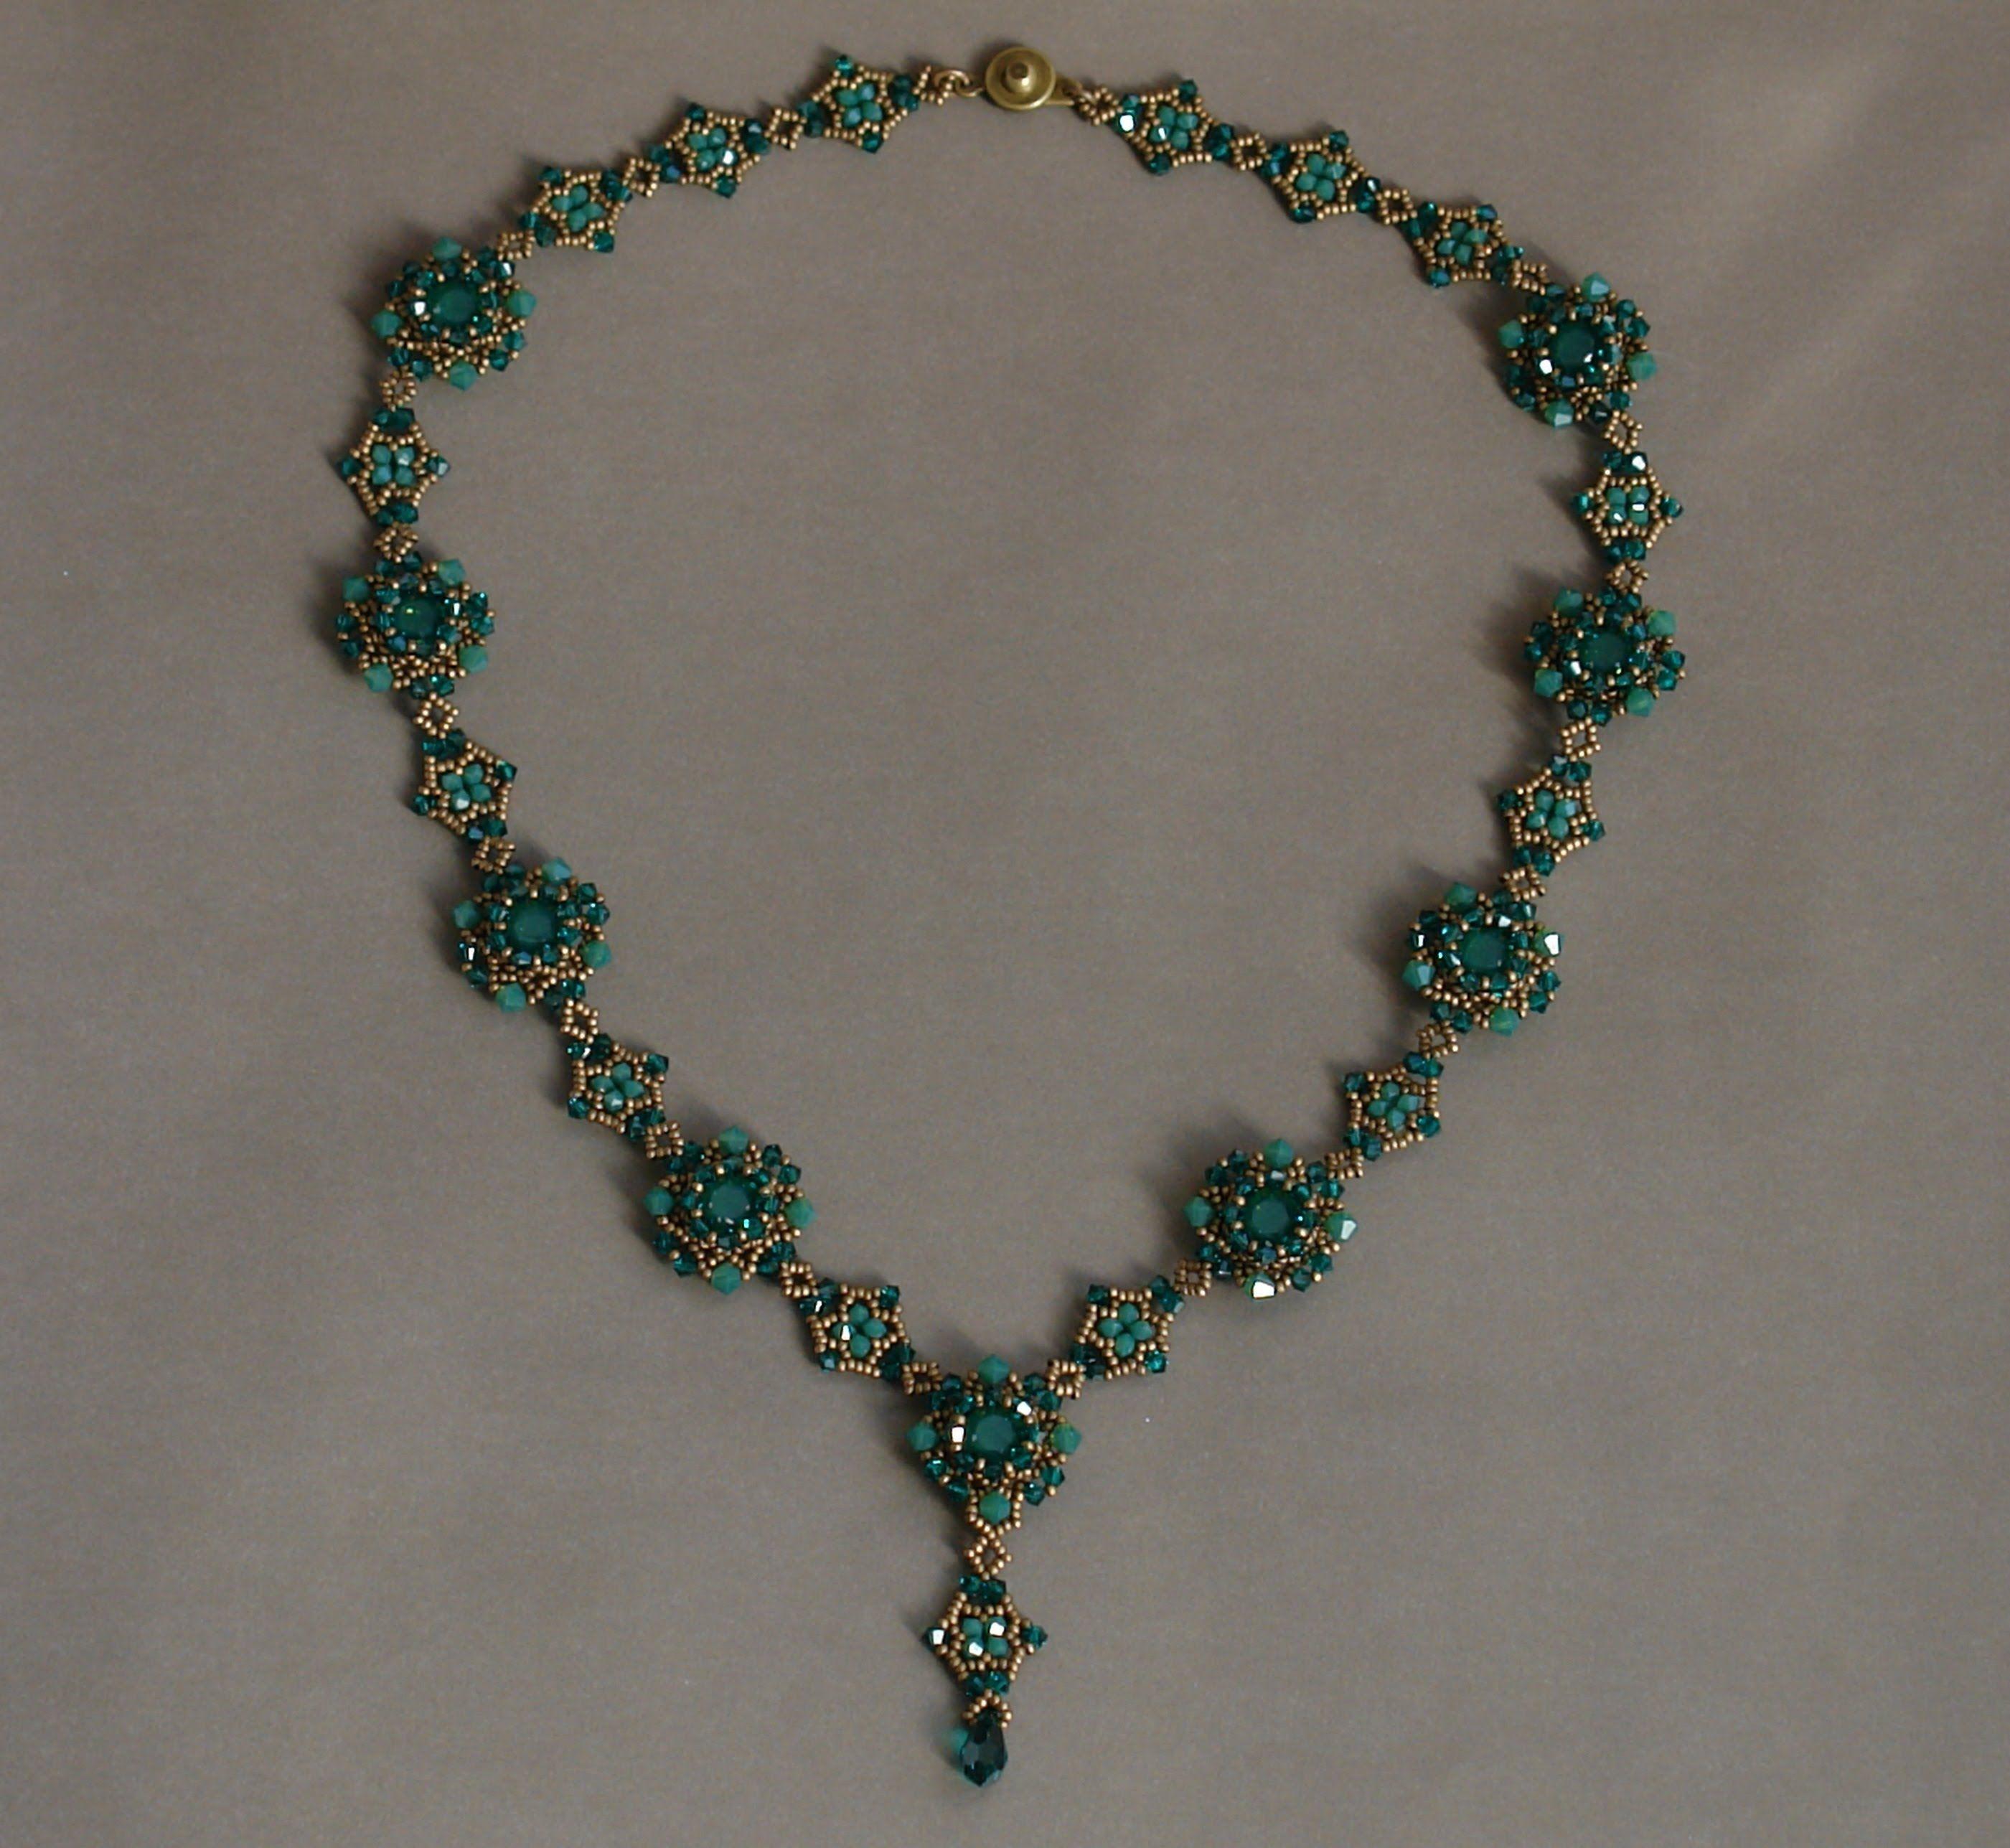 Sidonia's handmade jewelry - Sweet Romance beaded necklace tutorial